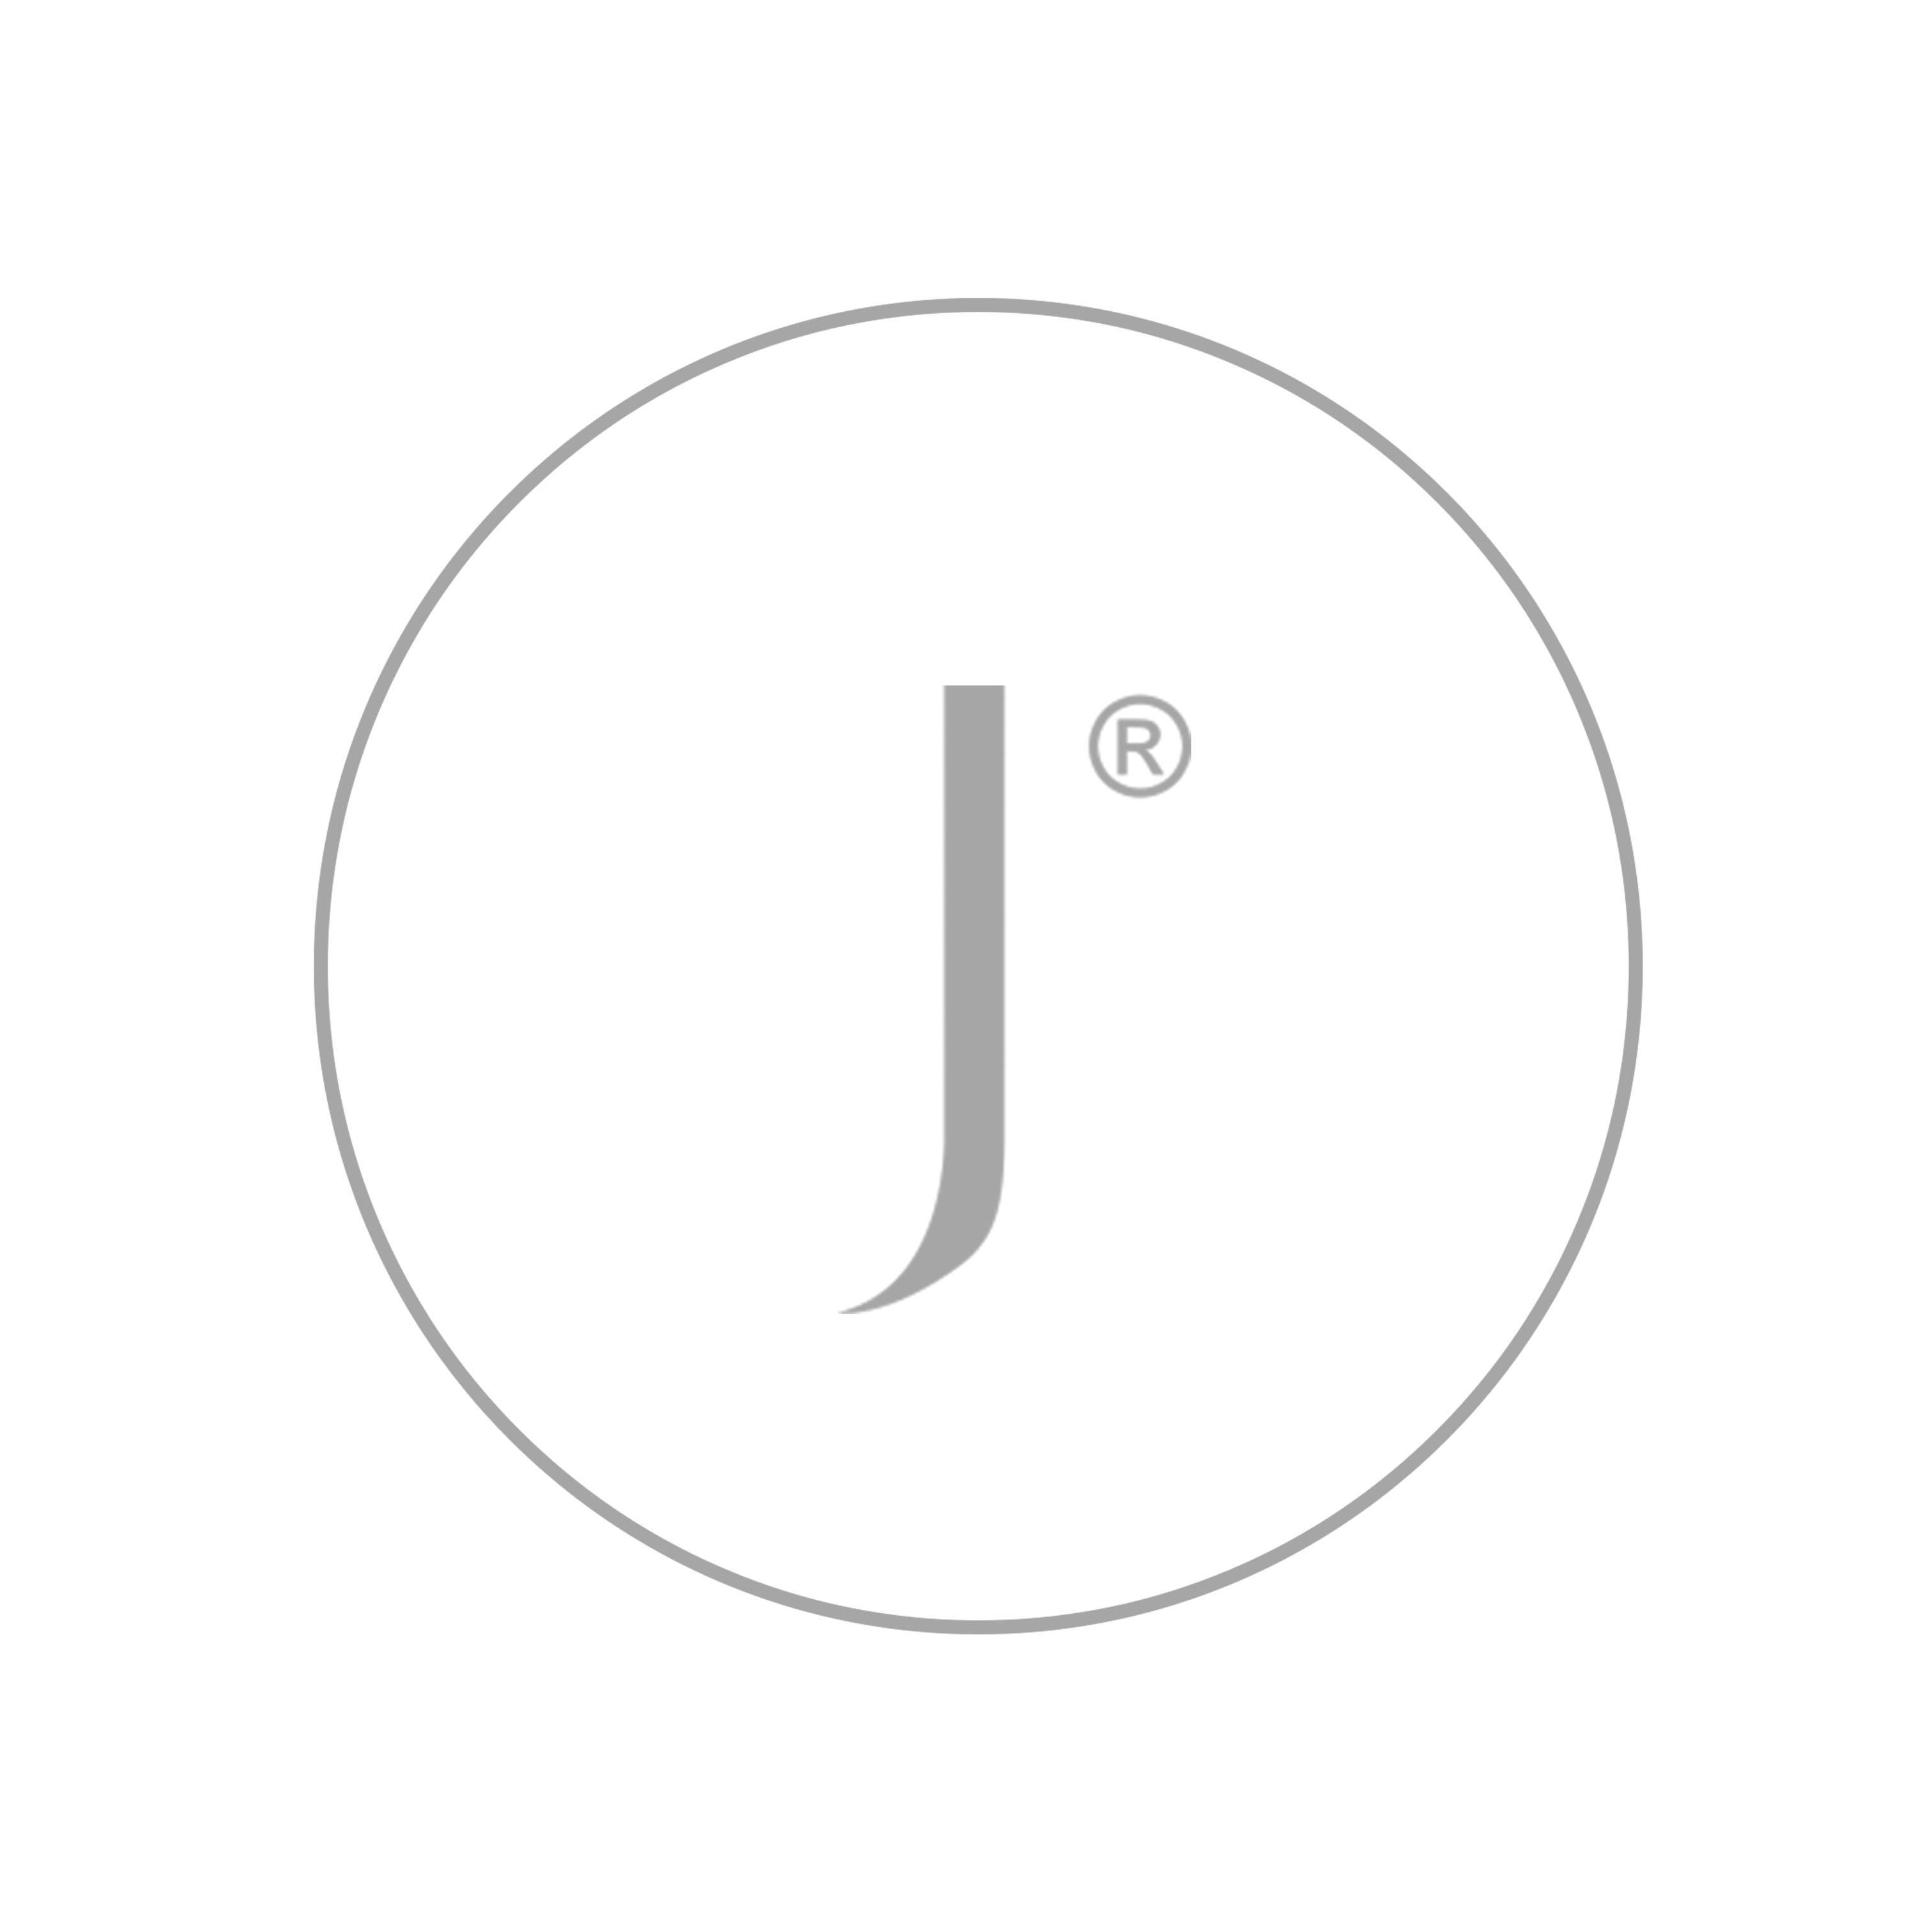 Pimlico Rose Gold Multi Gem Stud Earrings